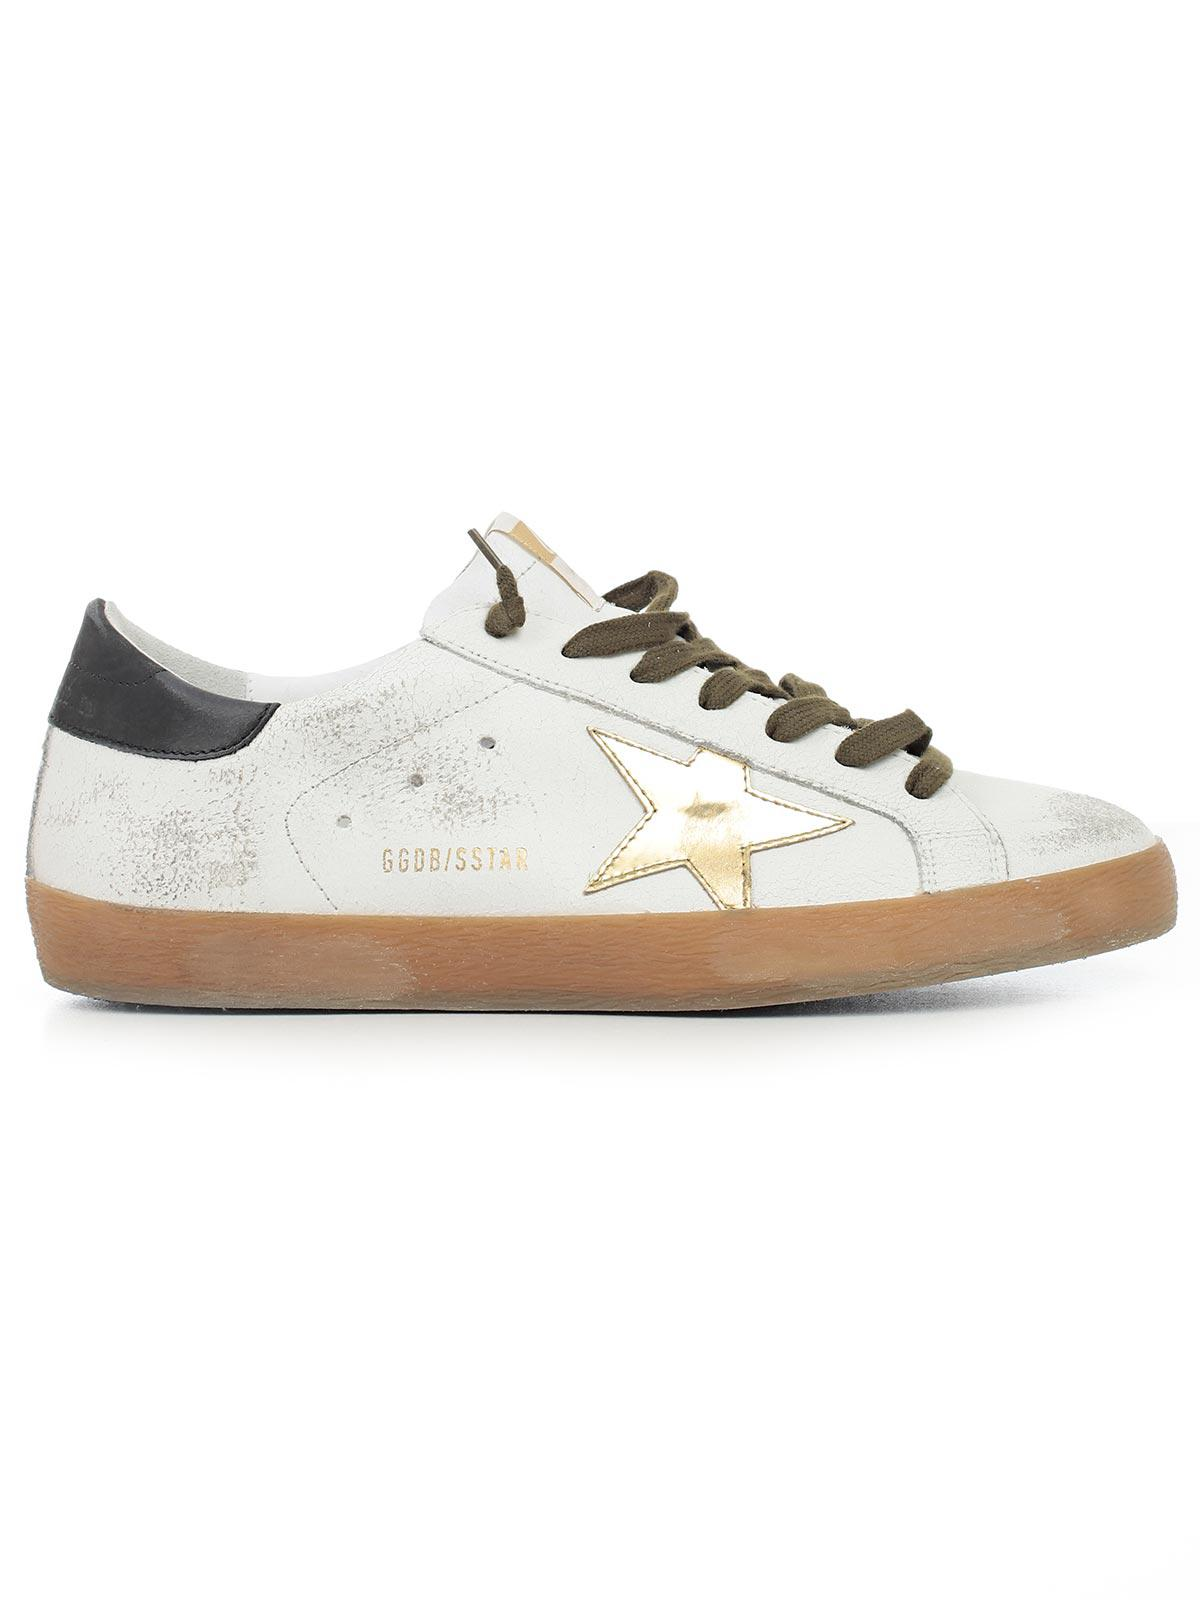 5955df42229fb Lyst - Golden Goose Deluxe Brand Sneakers Superstar in White for Men